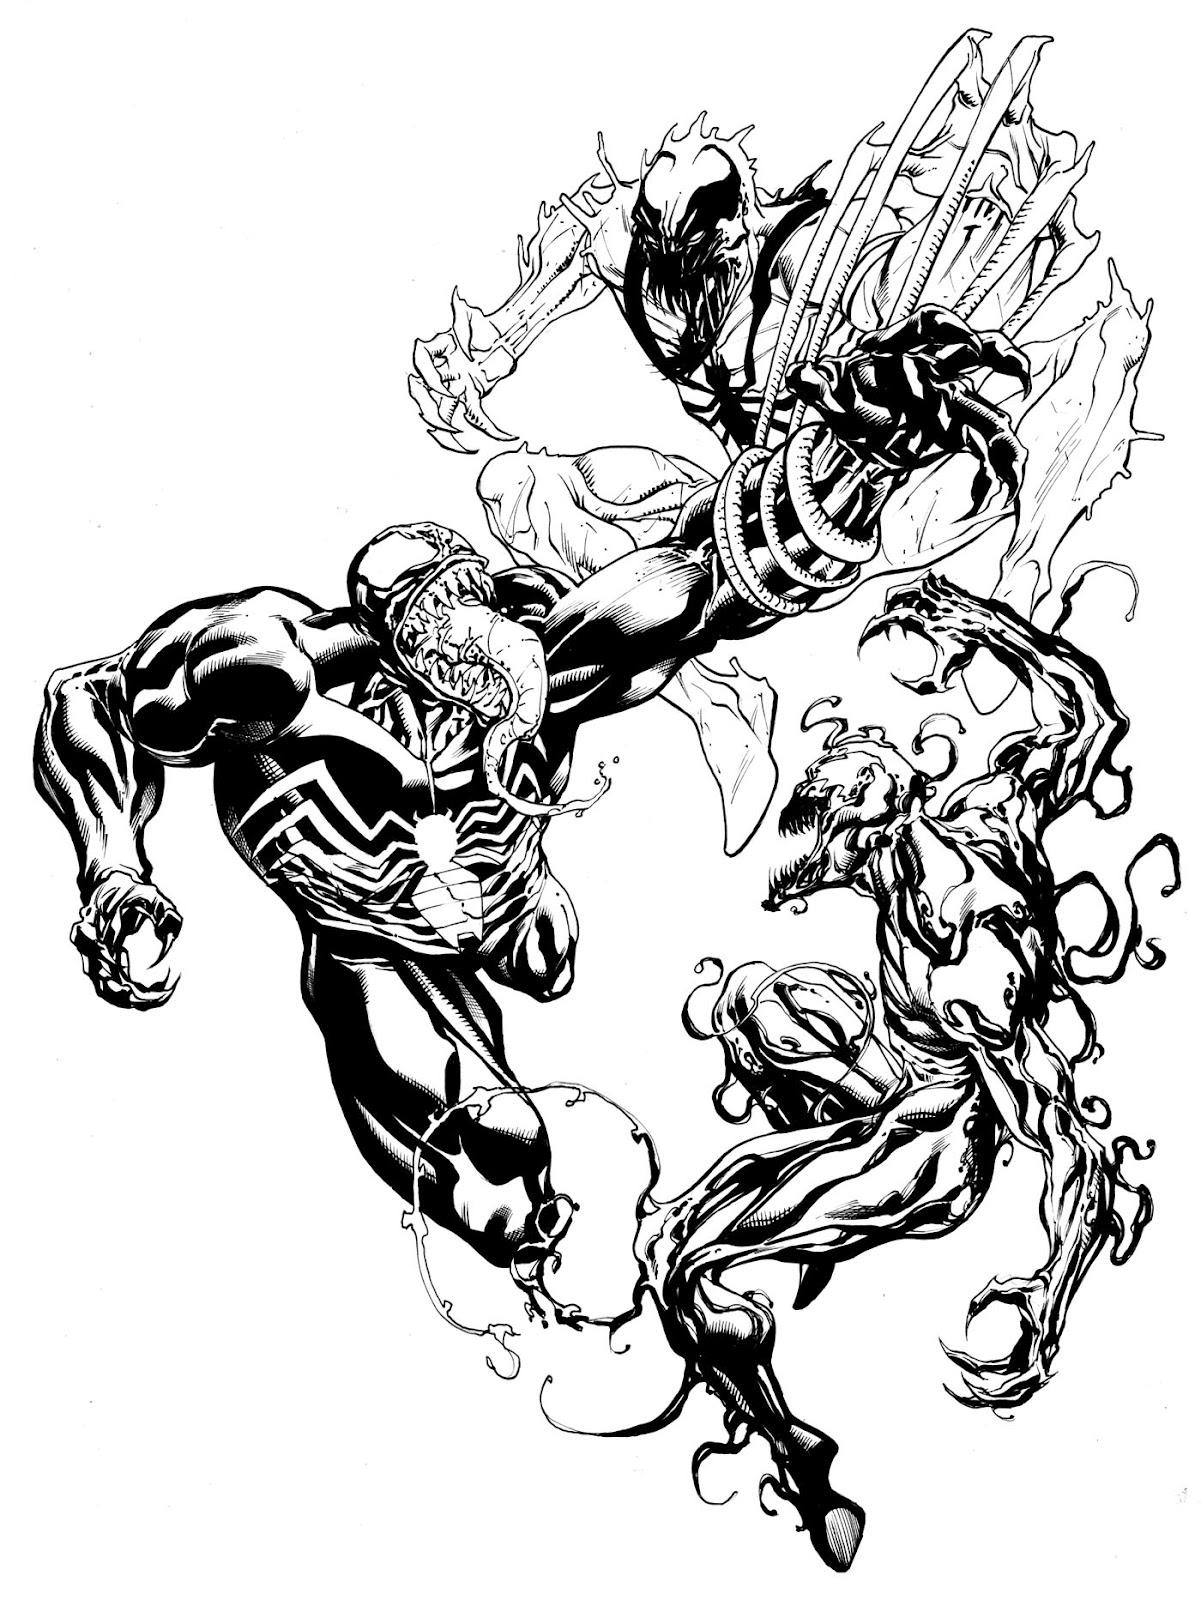 Spiderman vs carnage drawings - photo#53